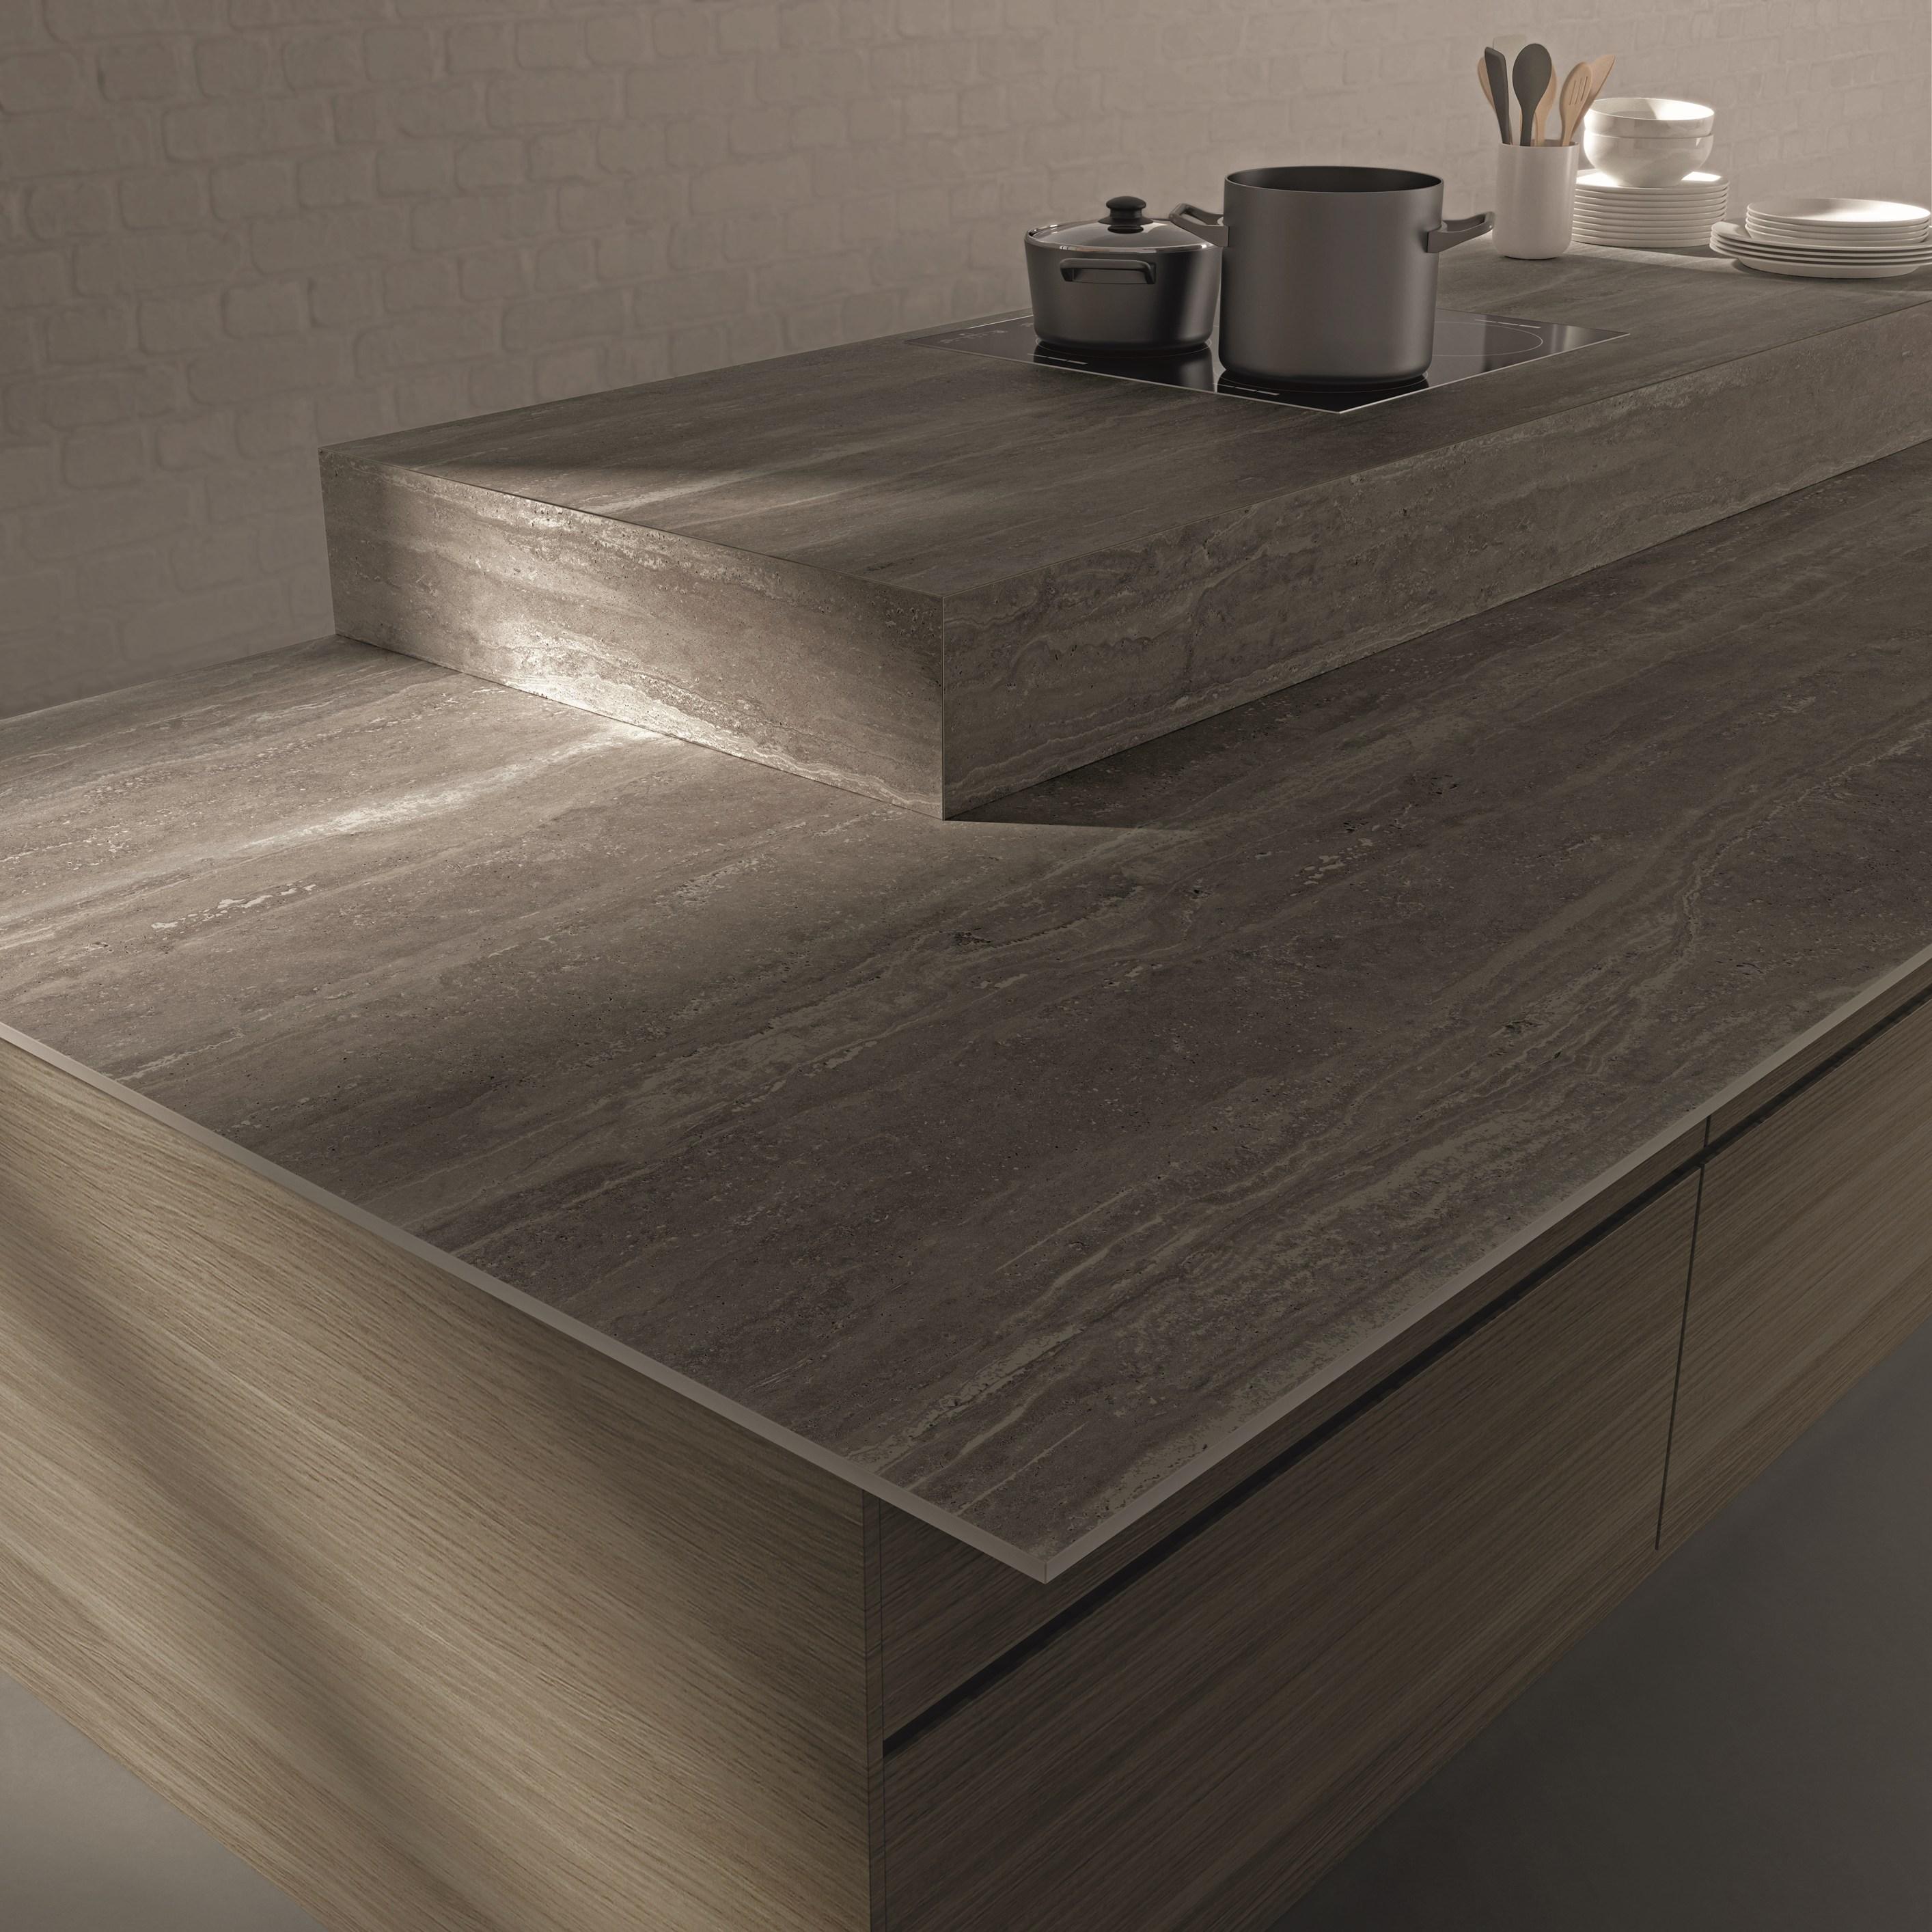 Emejing marmo piano cucina ideas home ideas - Piano cucina marmo ...